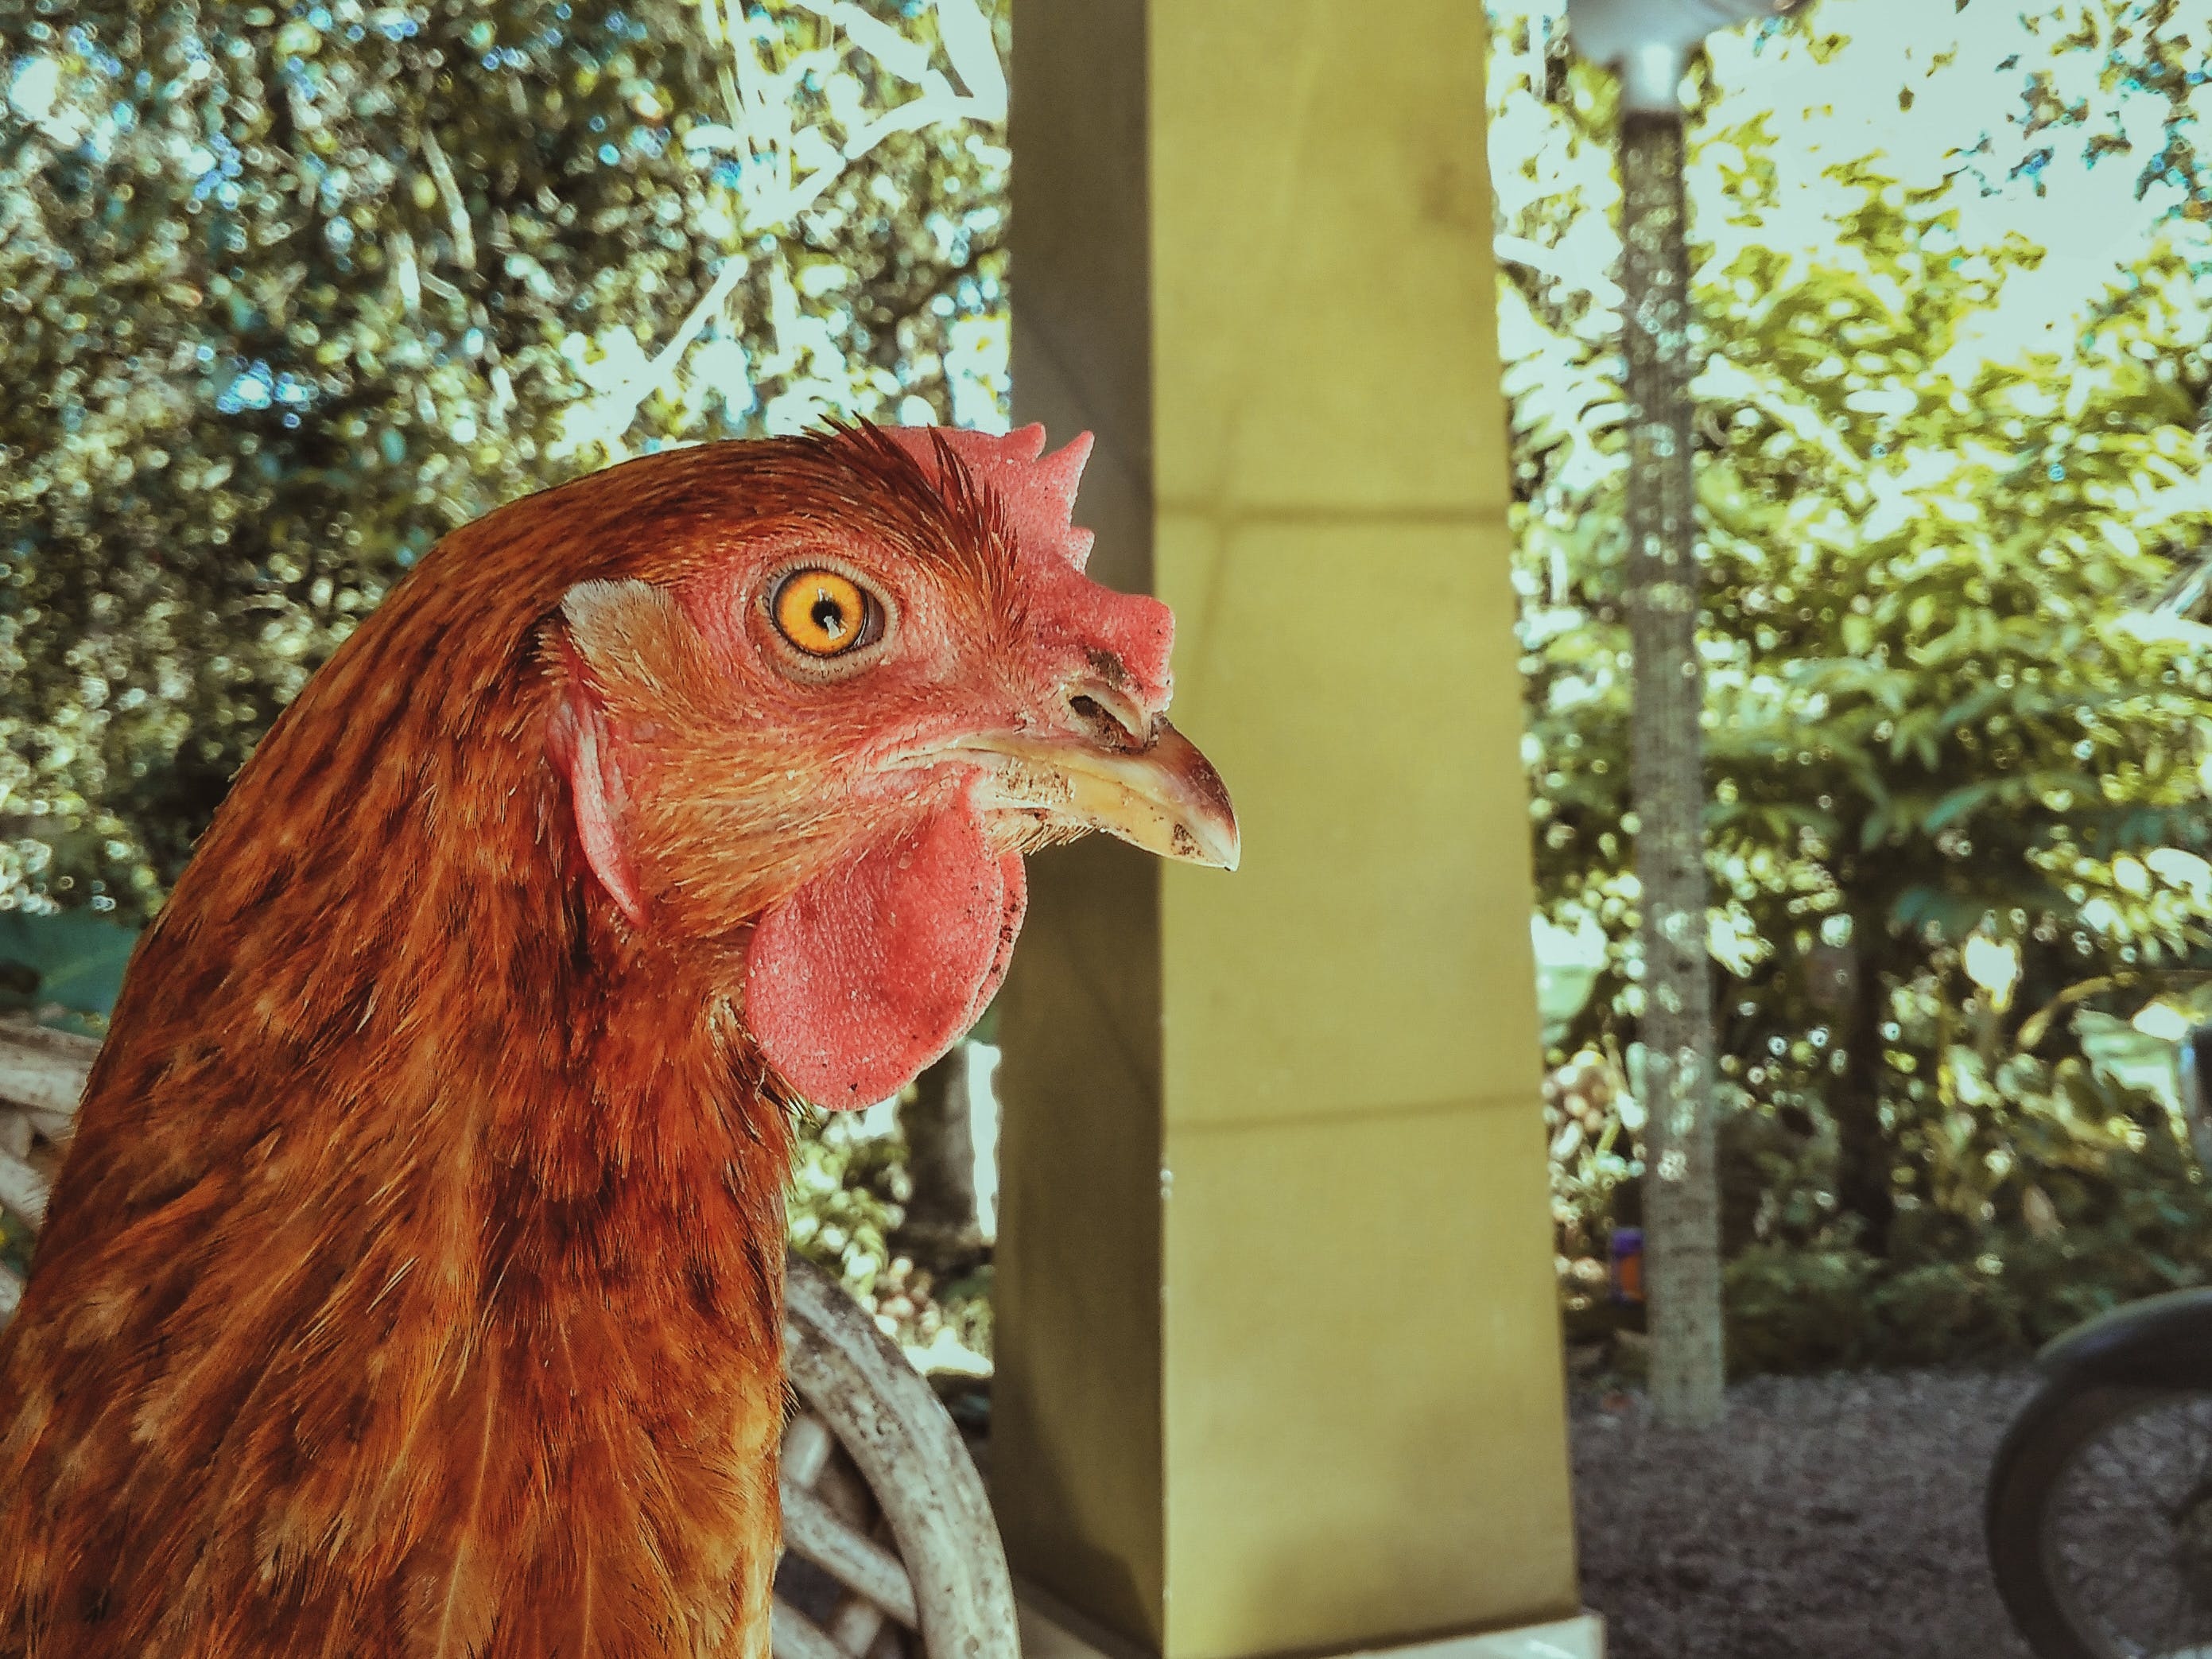 Fotos de stock gratuitas de aves de corral, doméstico, enfoque selectivo, gallina